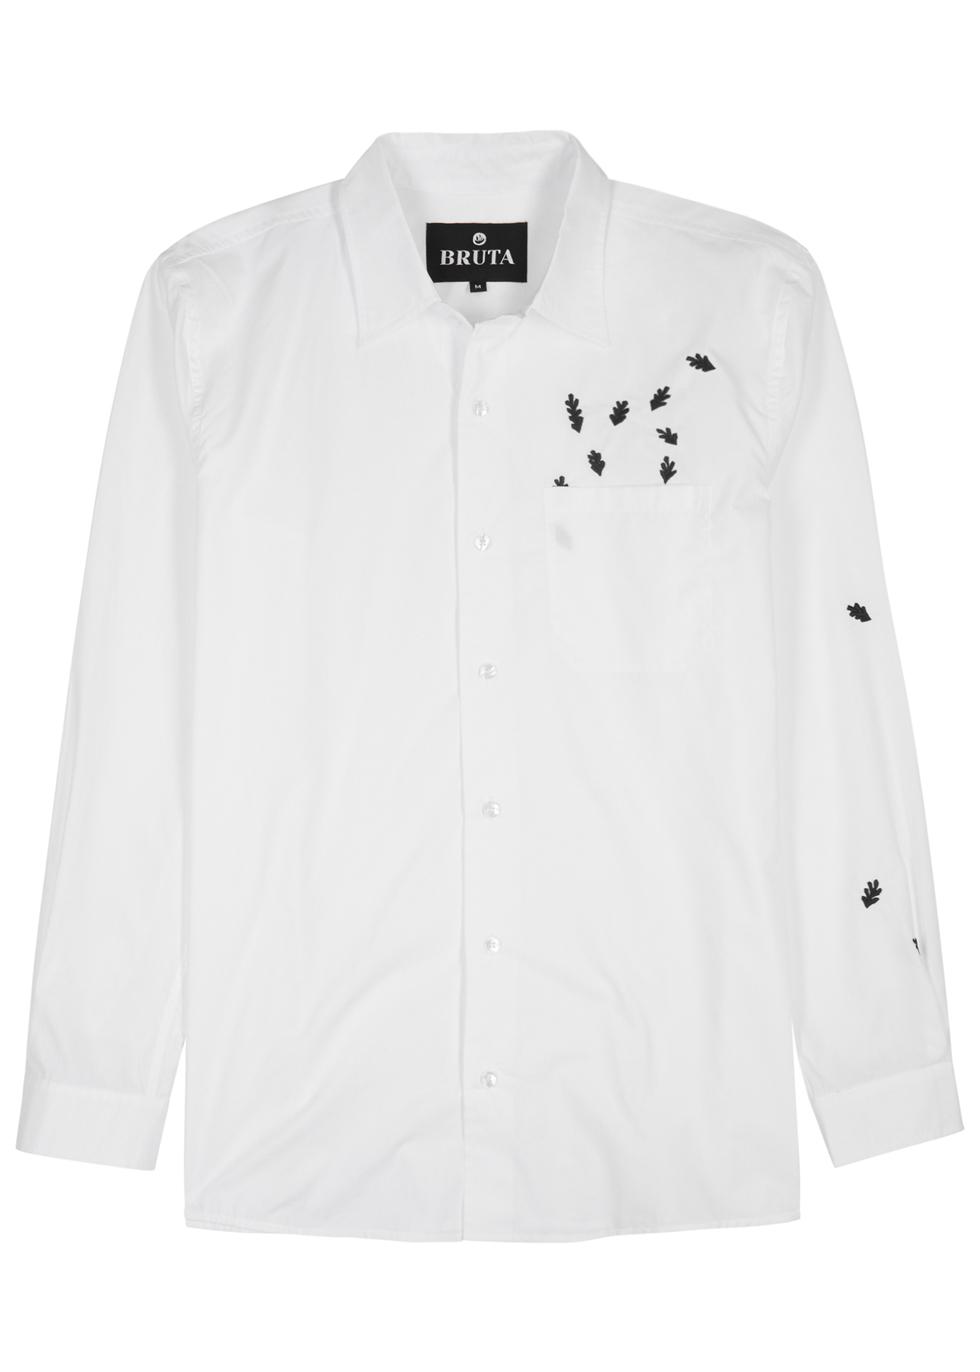 BRUTA Nipperkin White Cotton Shirt